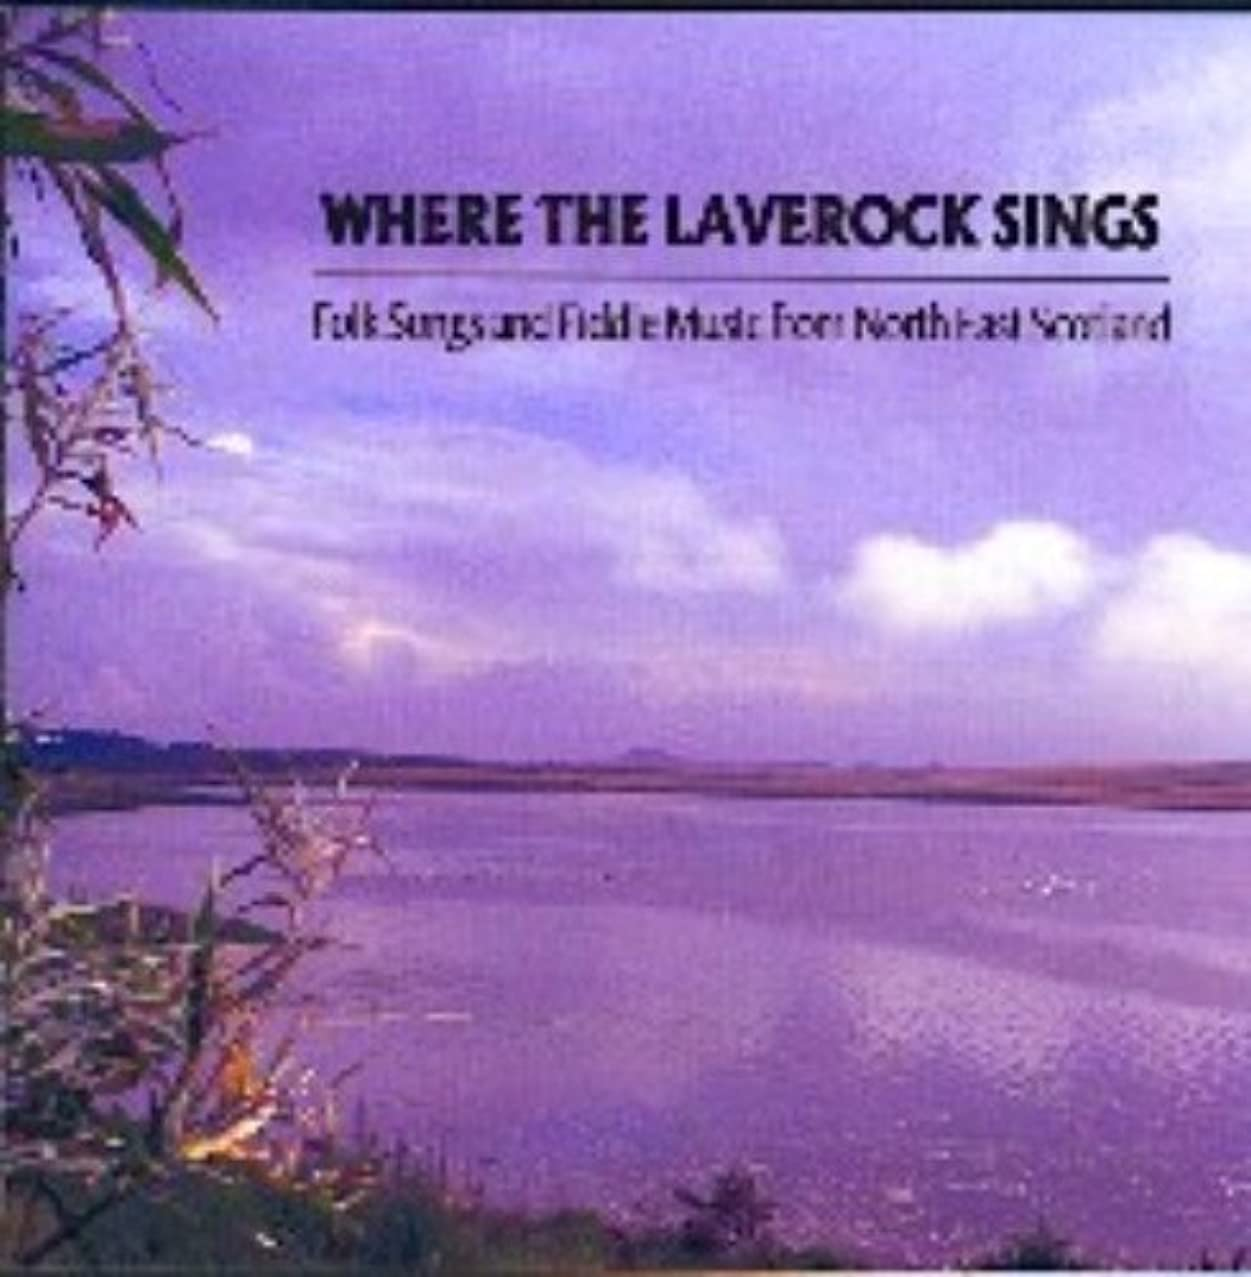 Where the Laverock Sings